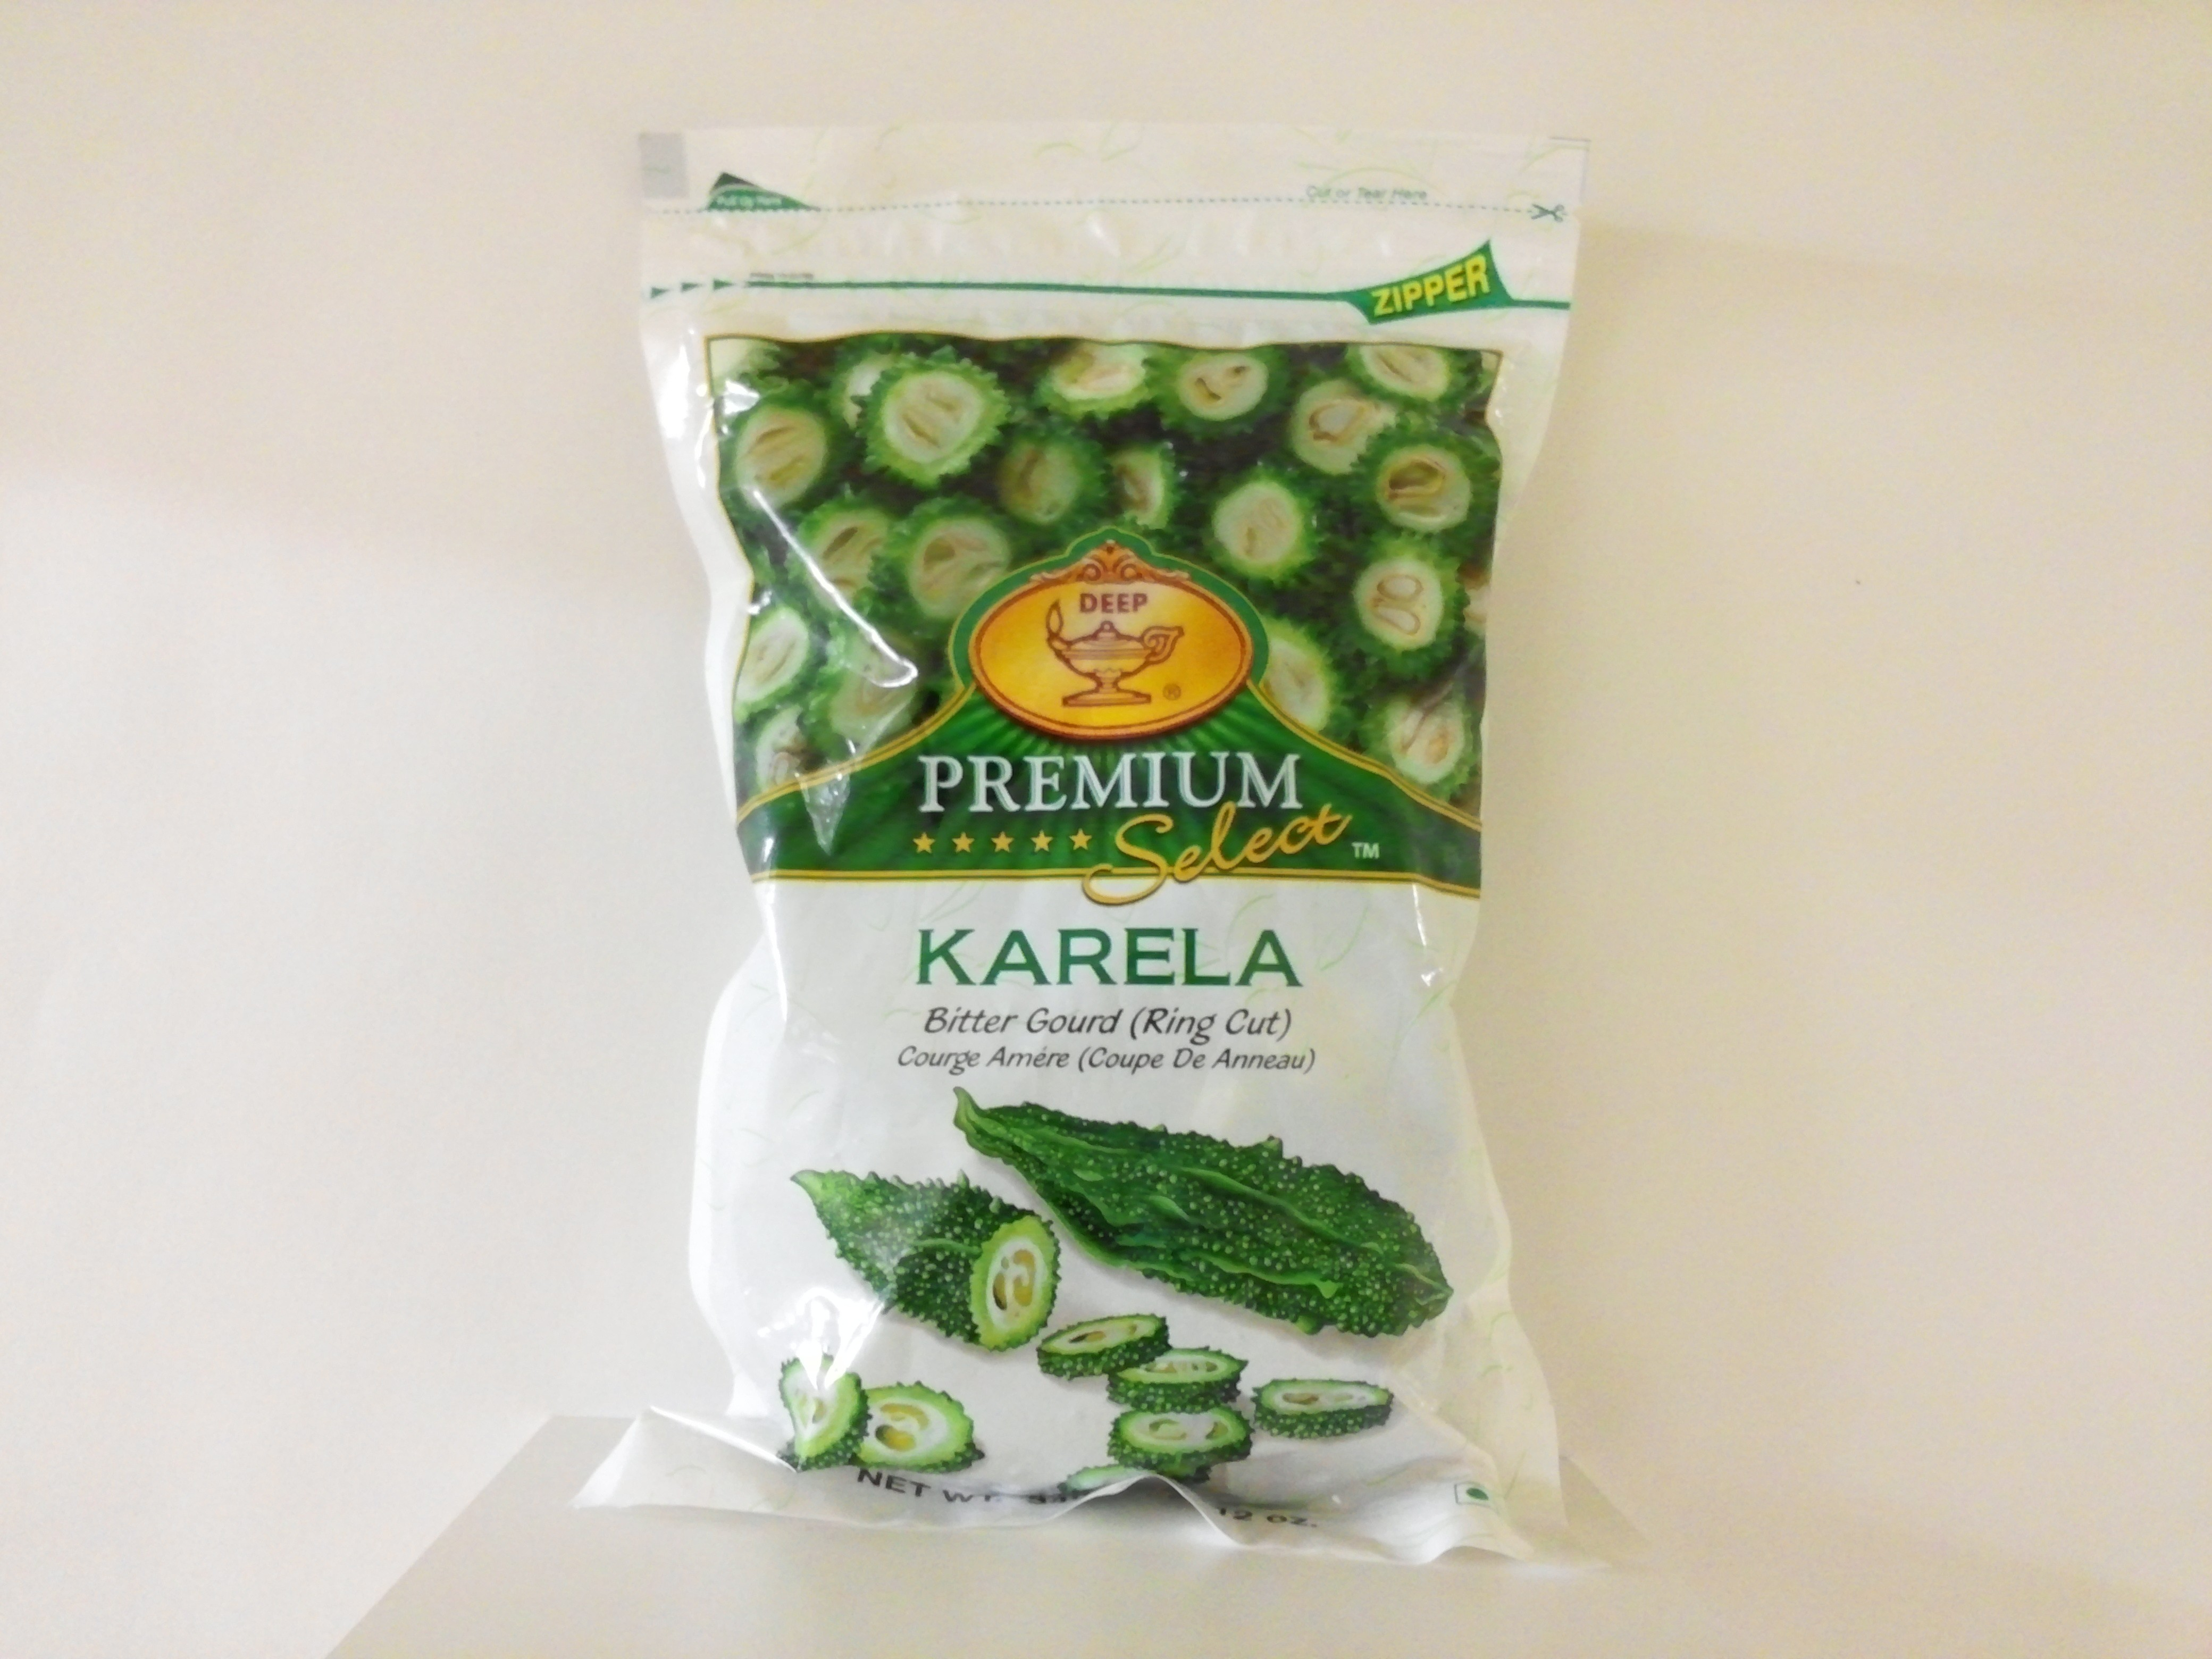 Deep Premium Karela 12 oz